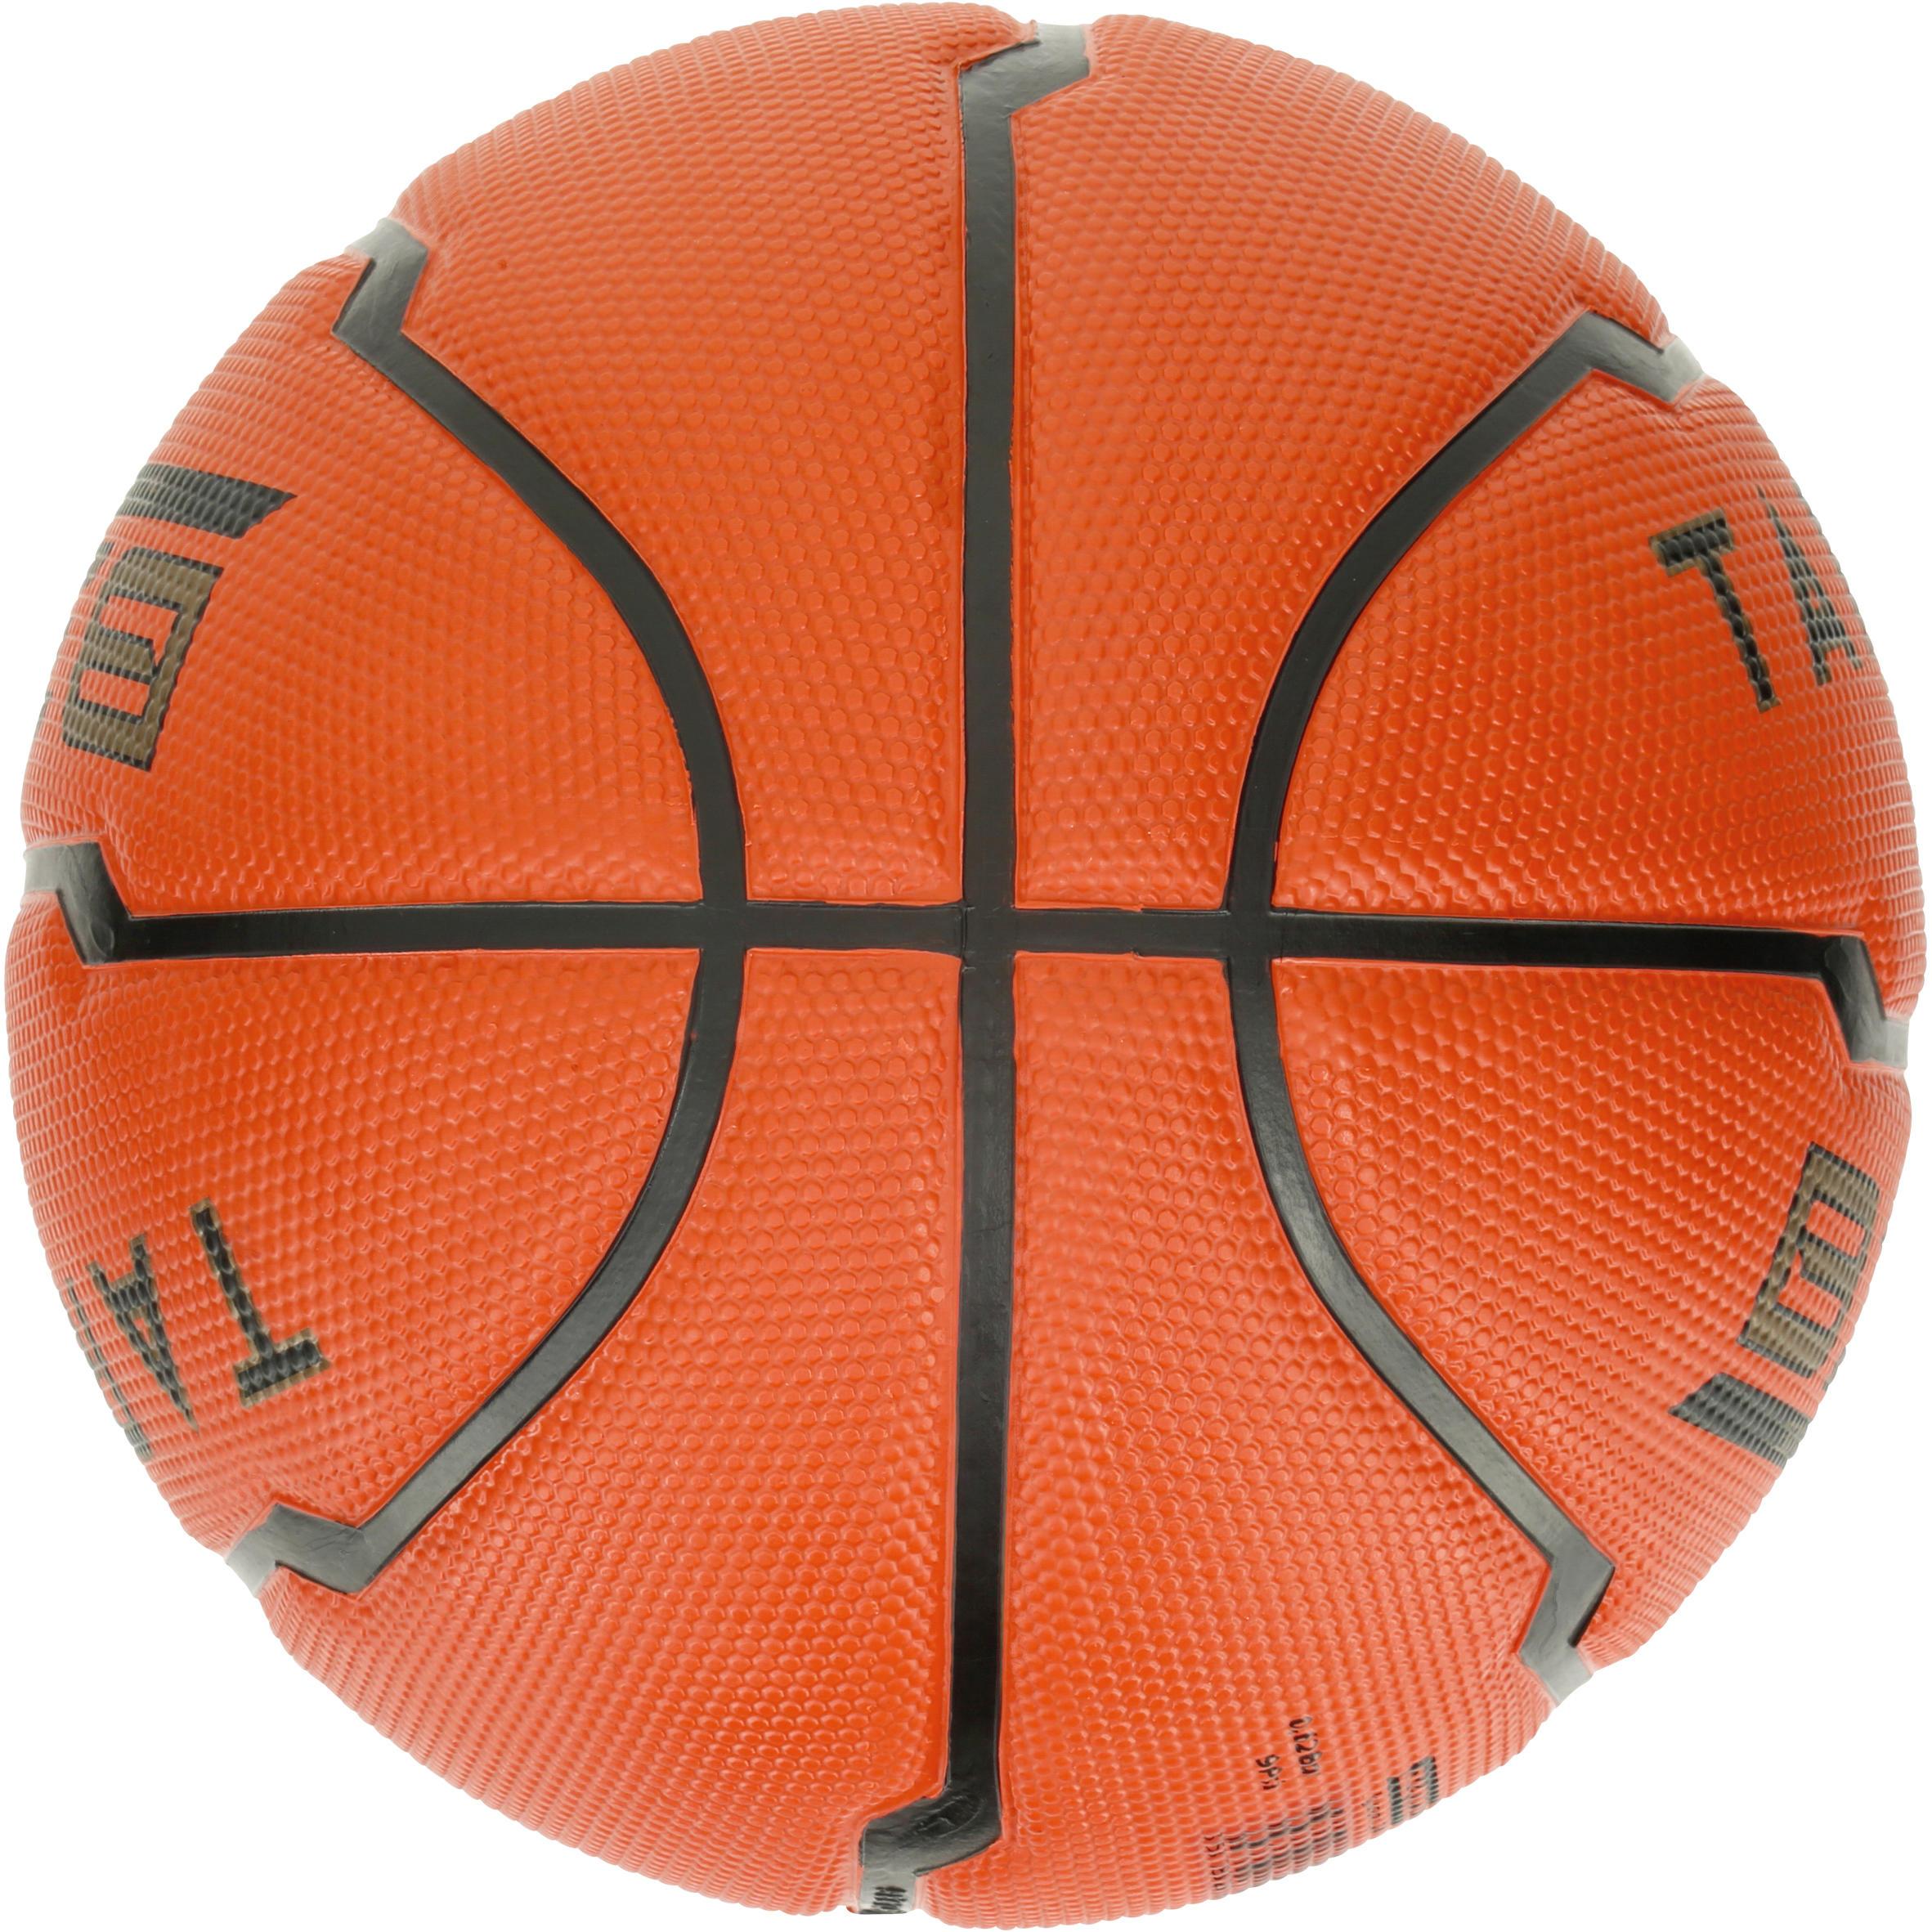 Ballon de basketball enfant B300 taille 5 orange